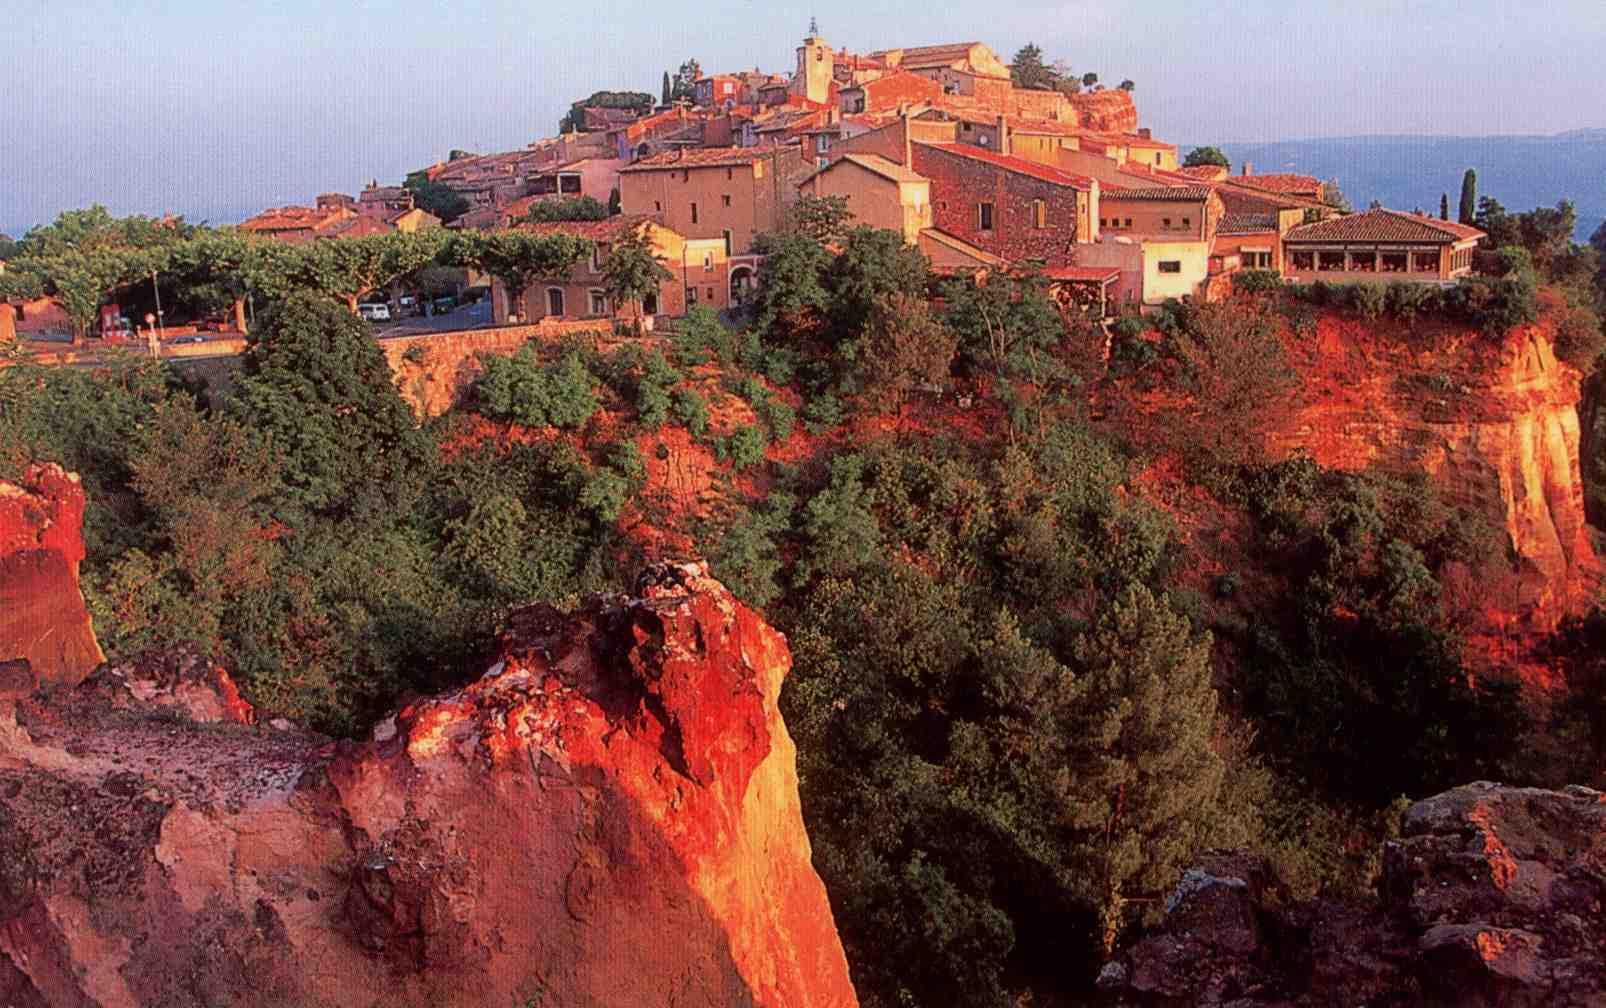 Hotel Pas Cher Languedoc Roubillon